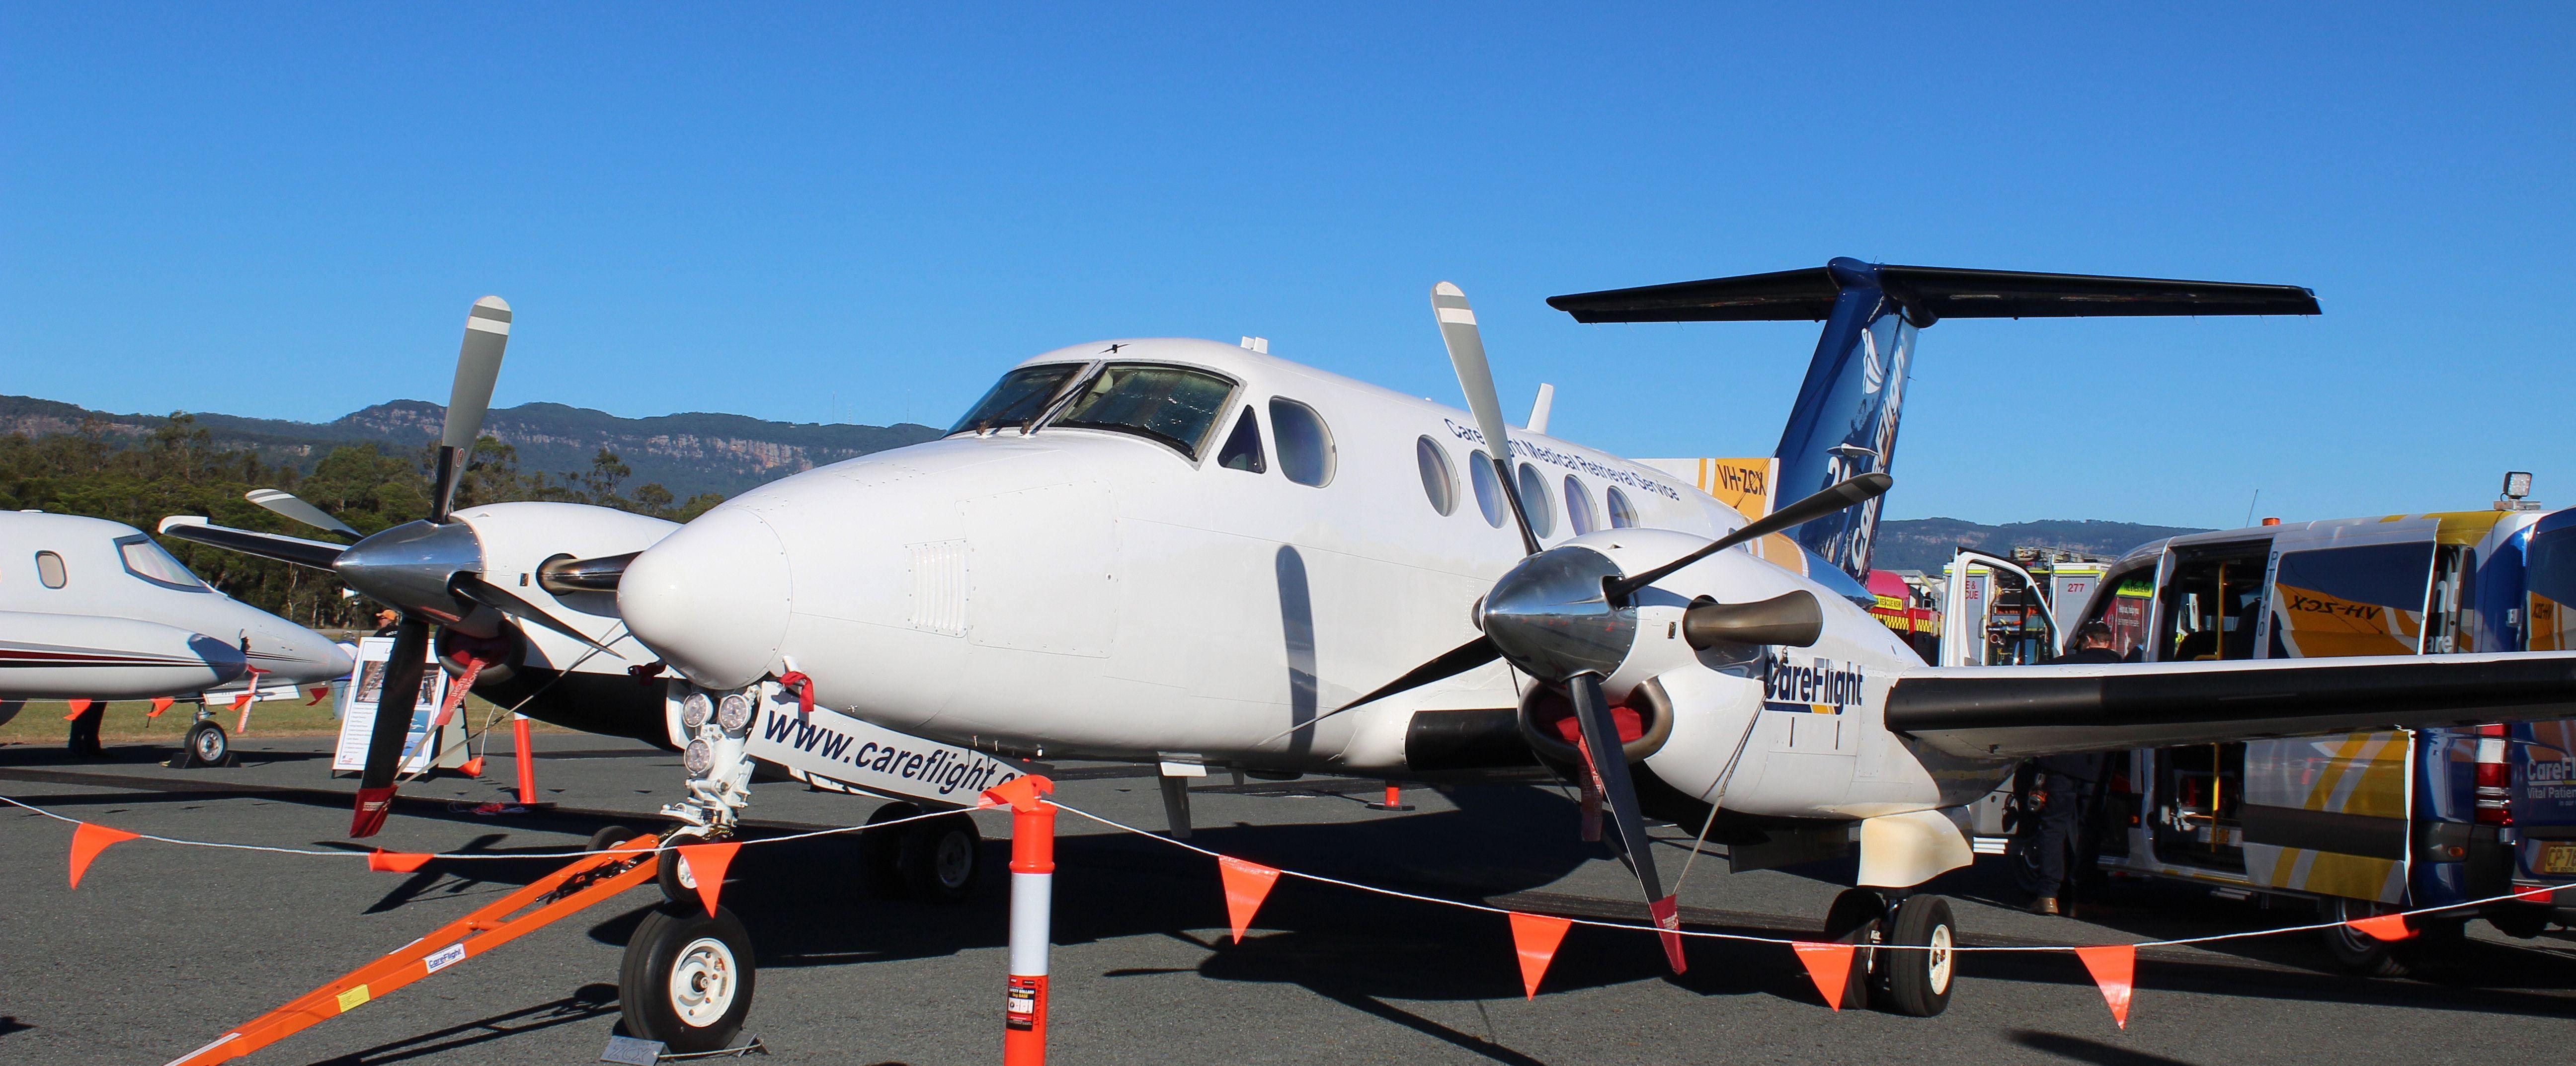 Hawker Beechcraft King Air B200 operated by CareFlight